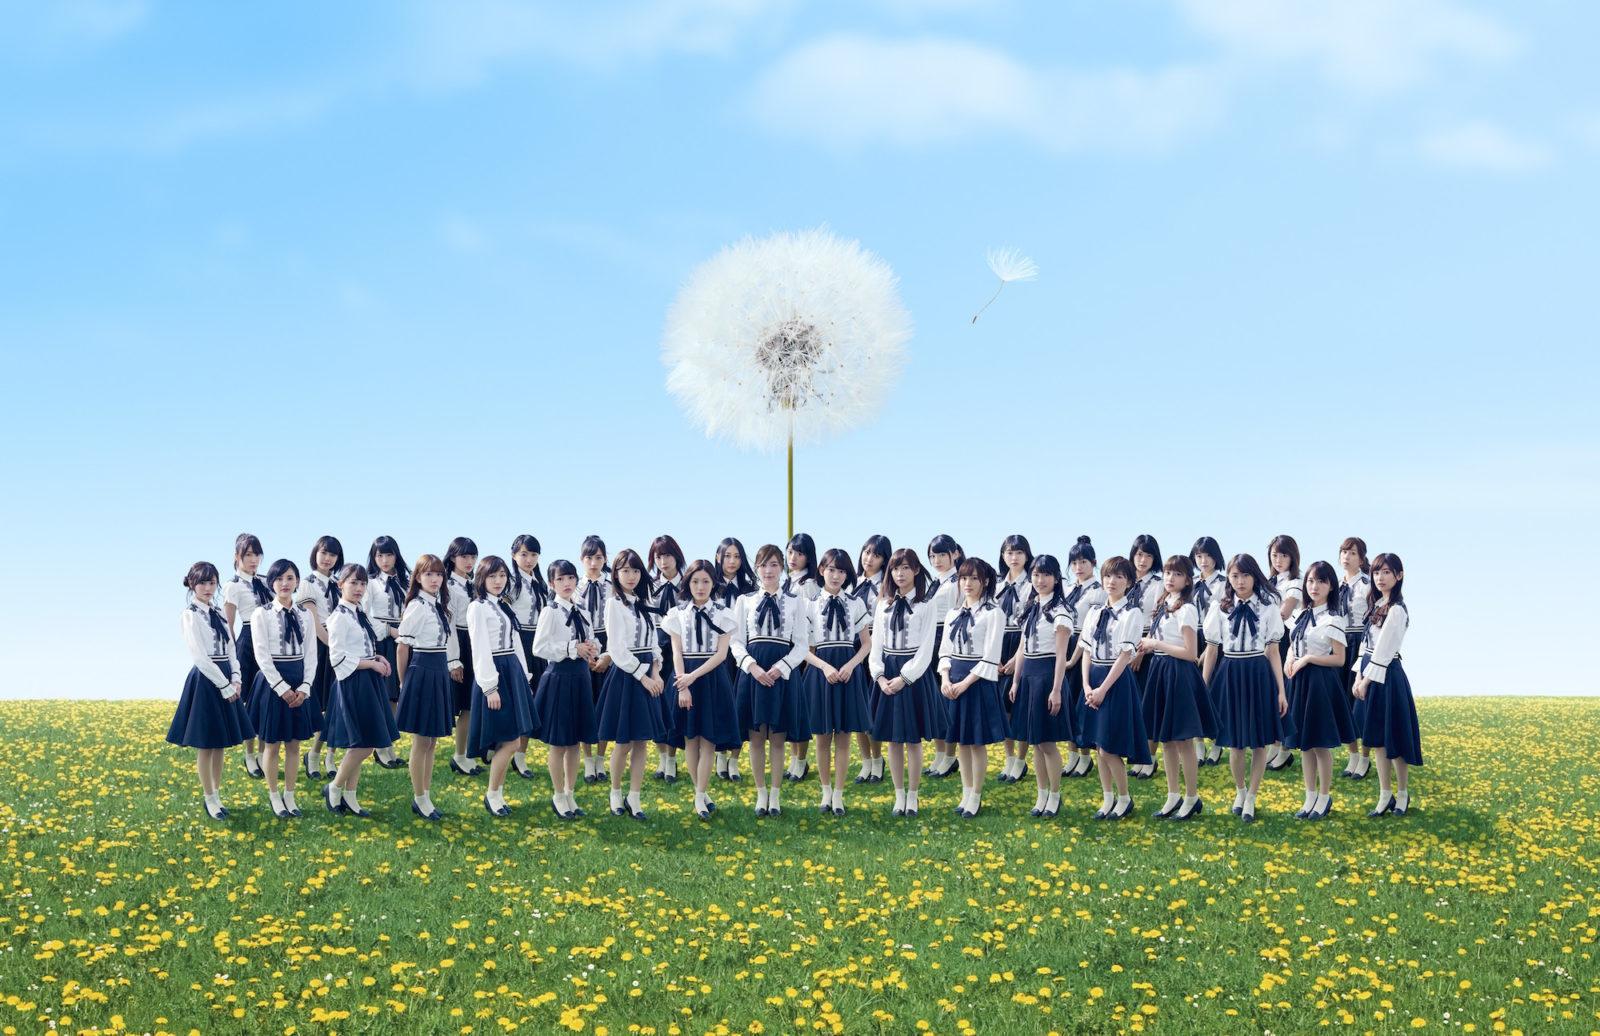 「THE MUSIC DAY 願いが叶う夏」に嵐、AKB48、乃木坂46、星野源ら70組以上が出演!KinKi Kids堂本光一は剛の回復を願ってスペシャルパフォーマンスサムネイル画像